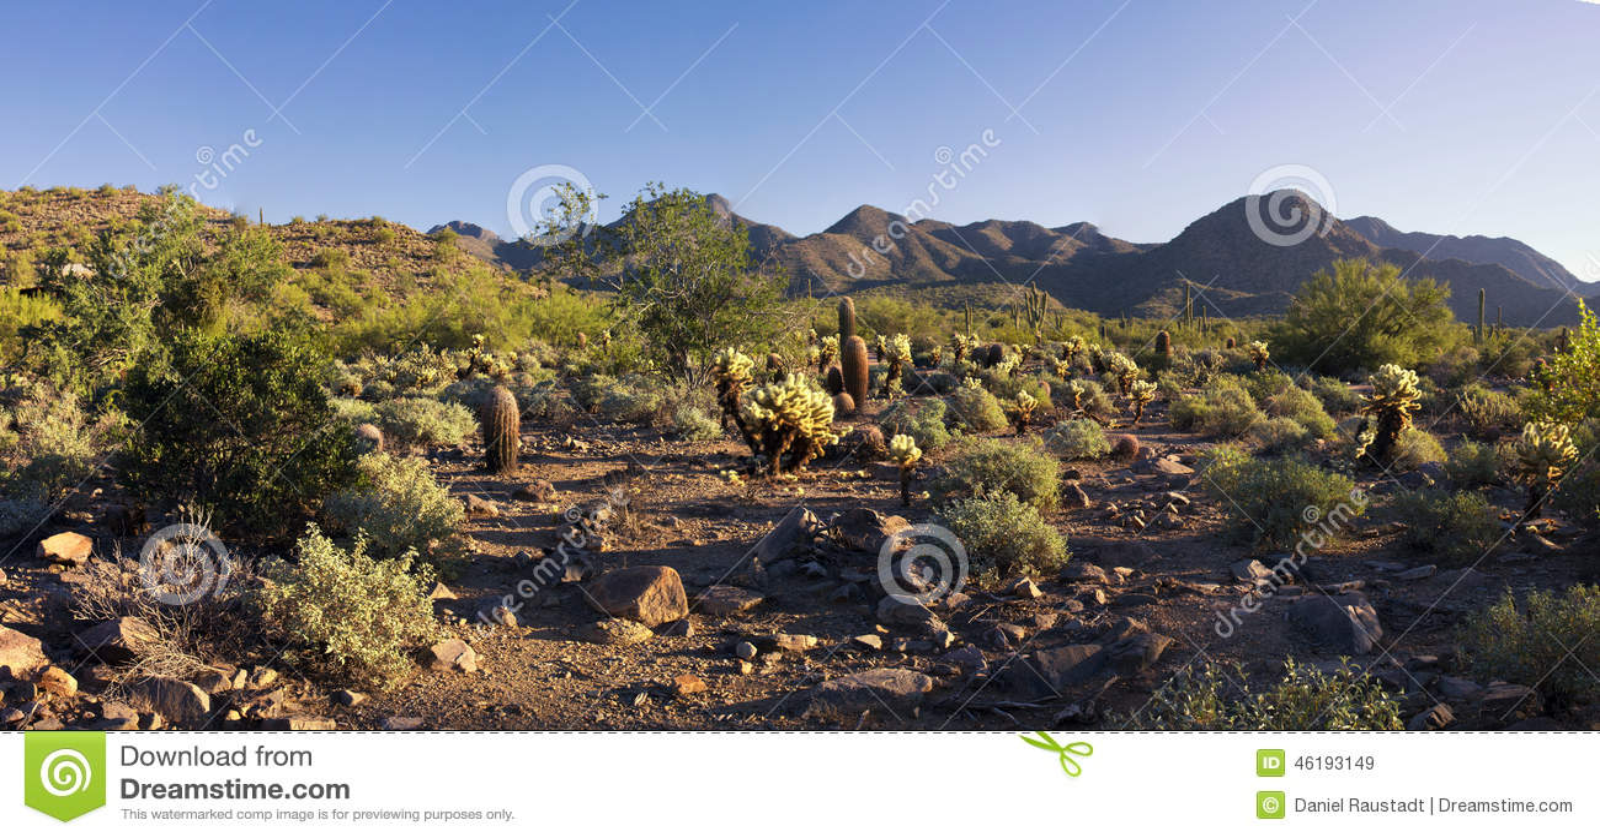 Горы пустыни Аризоны